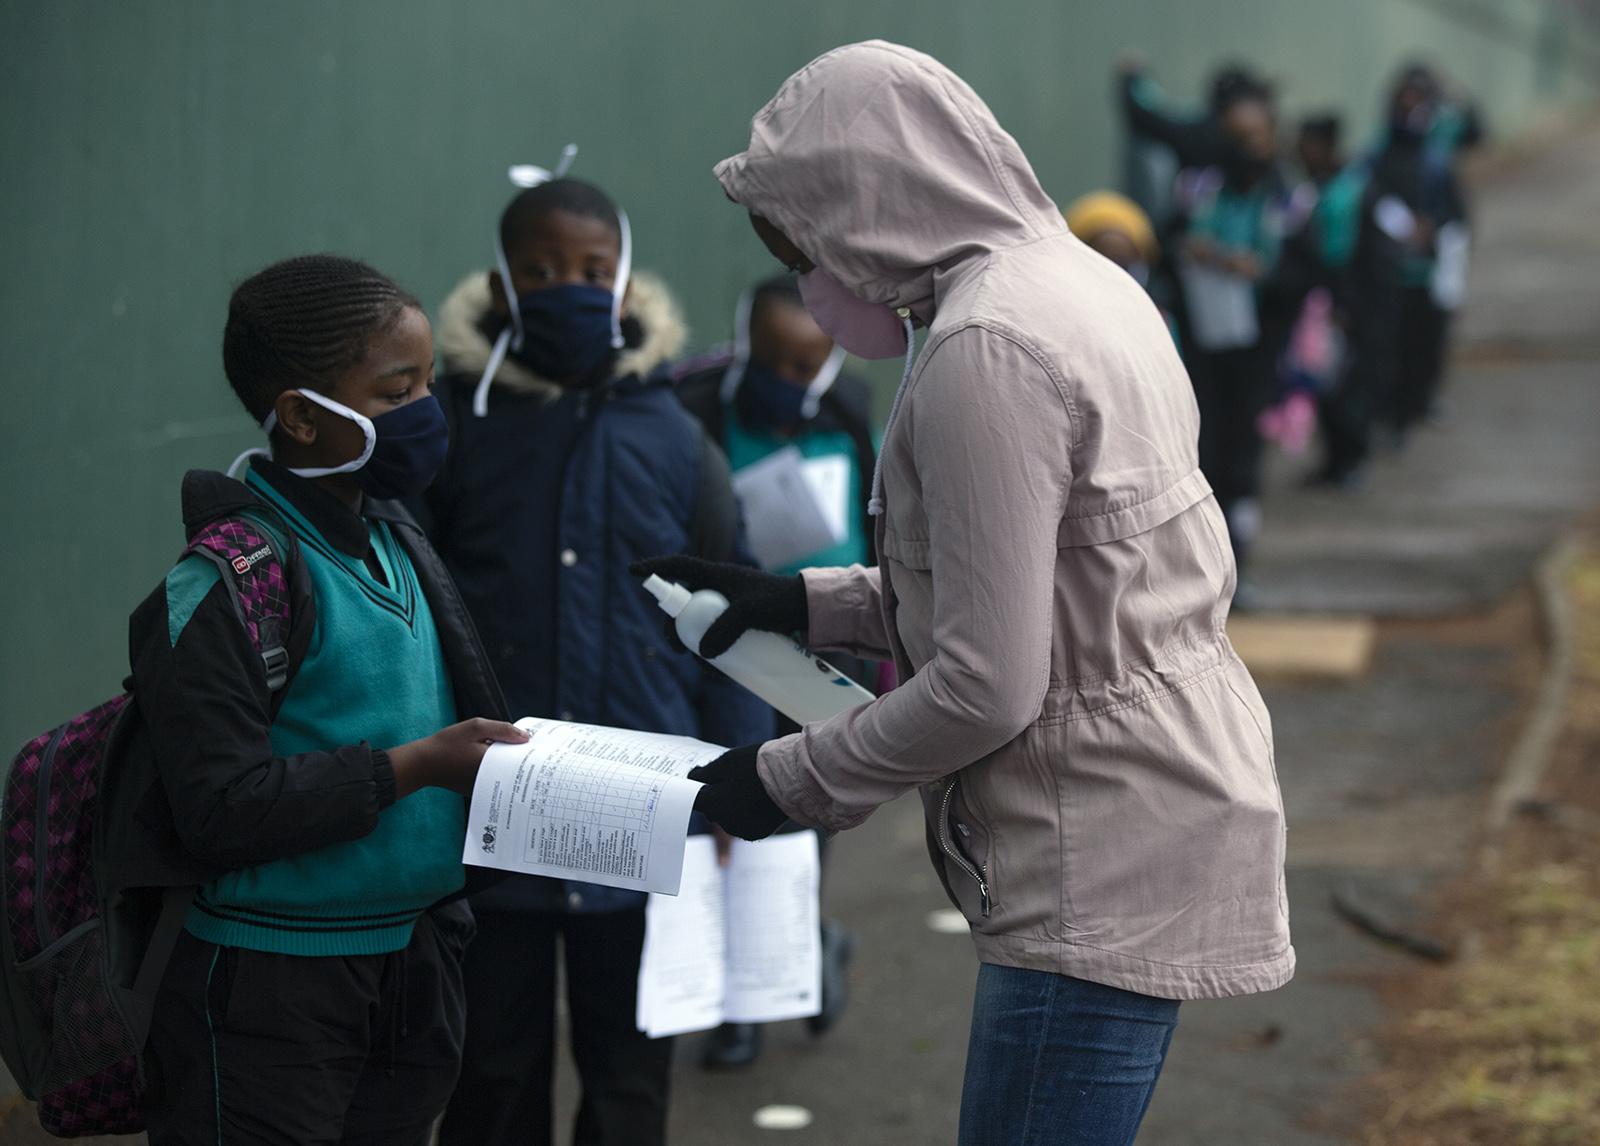 Learners go through the regular morning checks on their arrival at the Melpark Primary School in Johannesburg on Thursday, September 3.